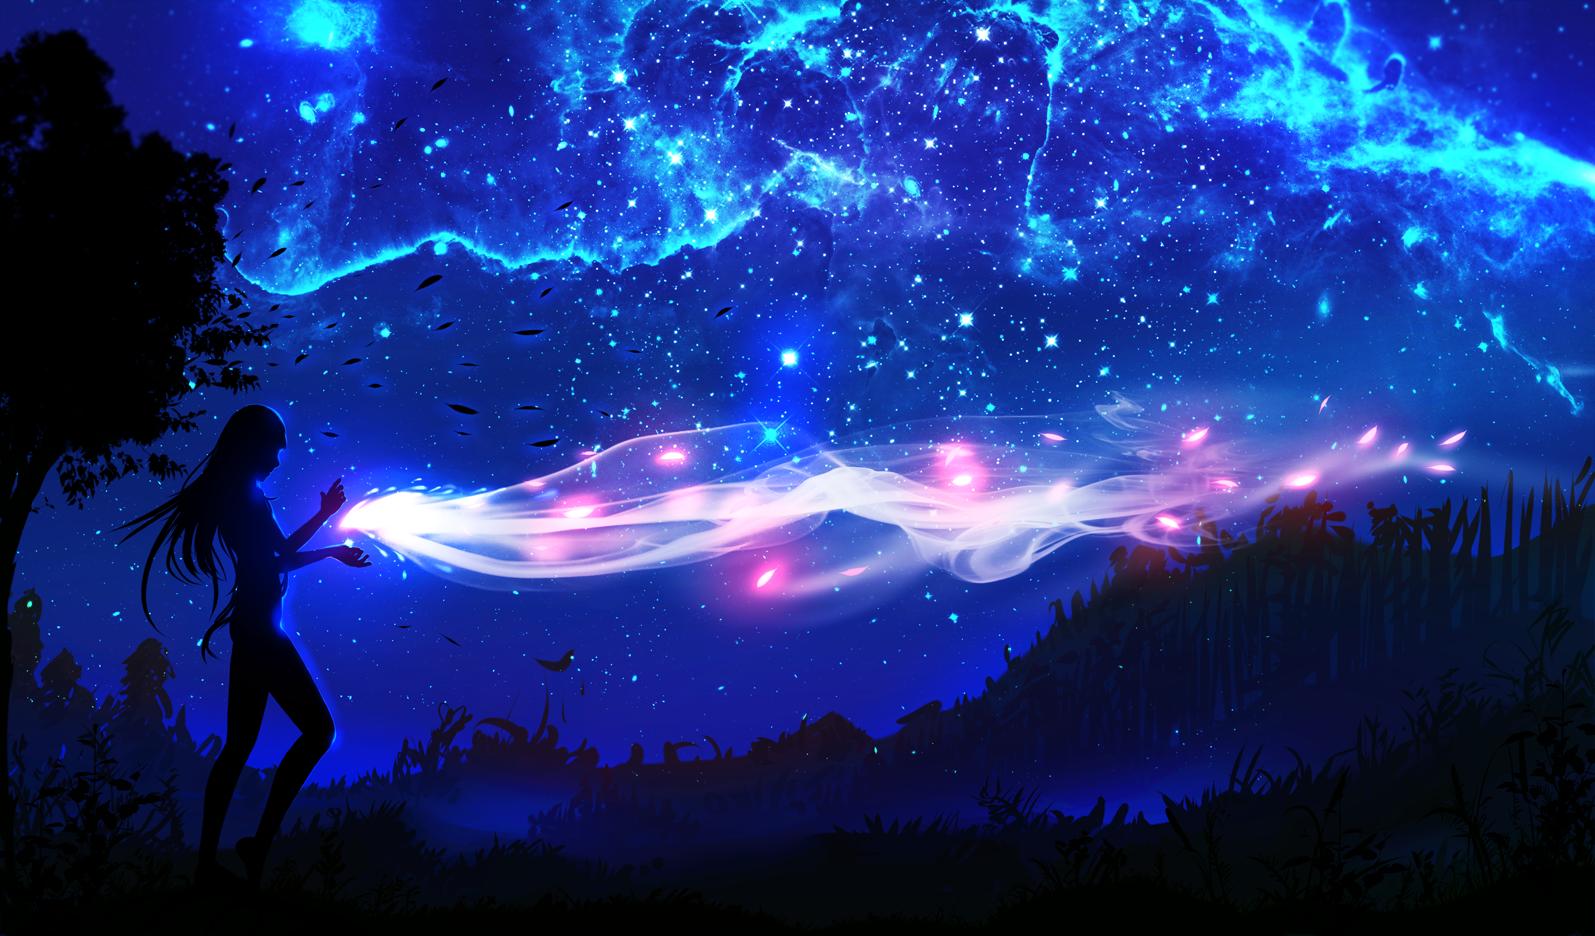 Wind Elemental By Ryky On Deviantart